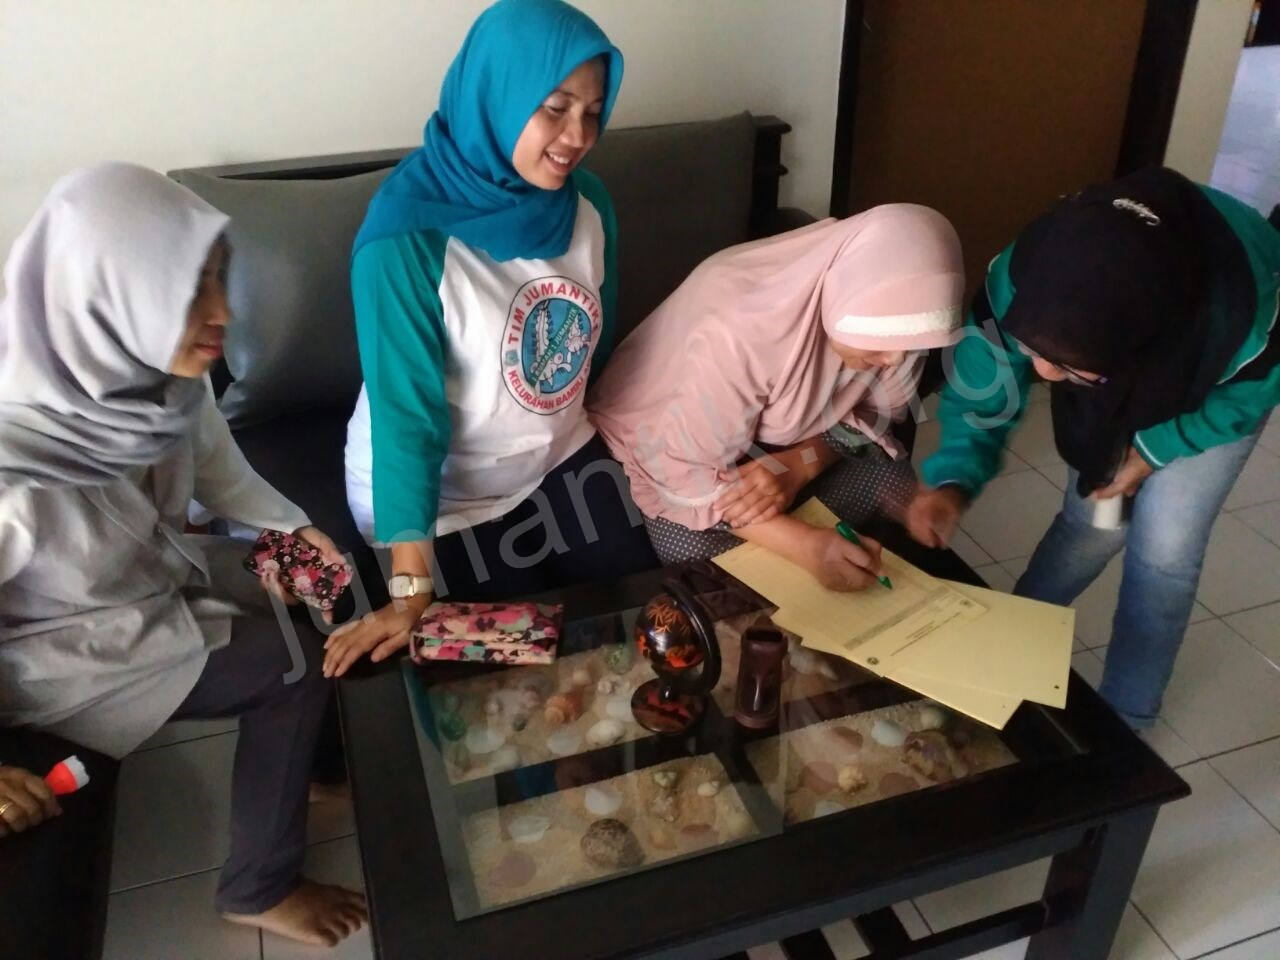 Jumantikers_gerebek_kampung_kelurahan_bambu_apus28.jpg